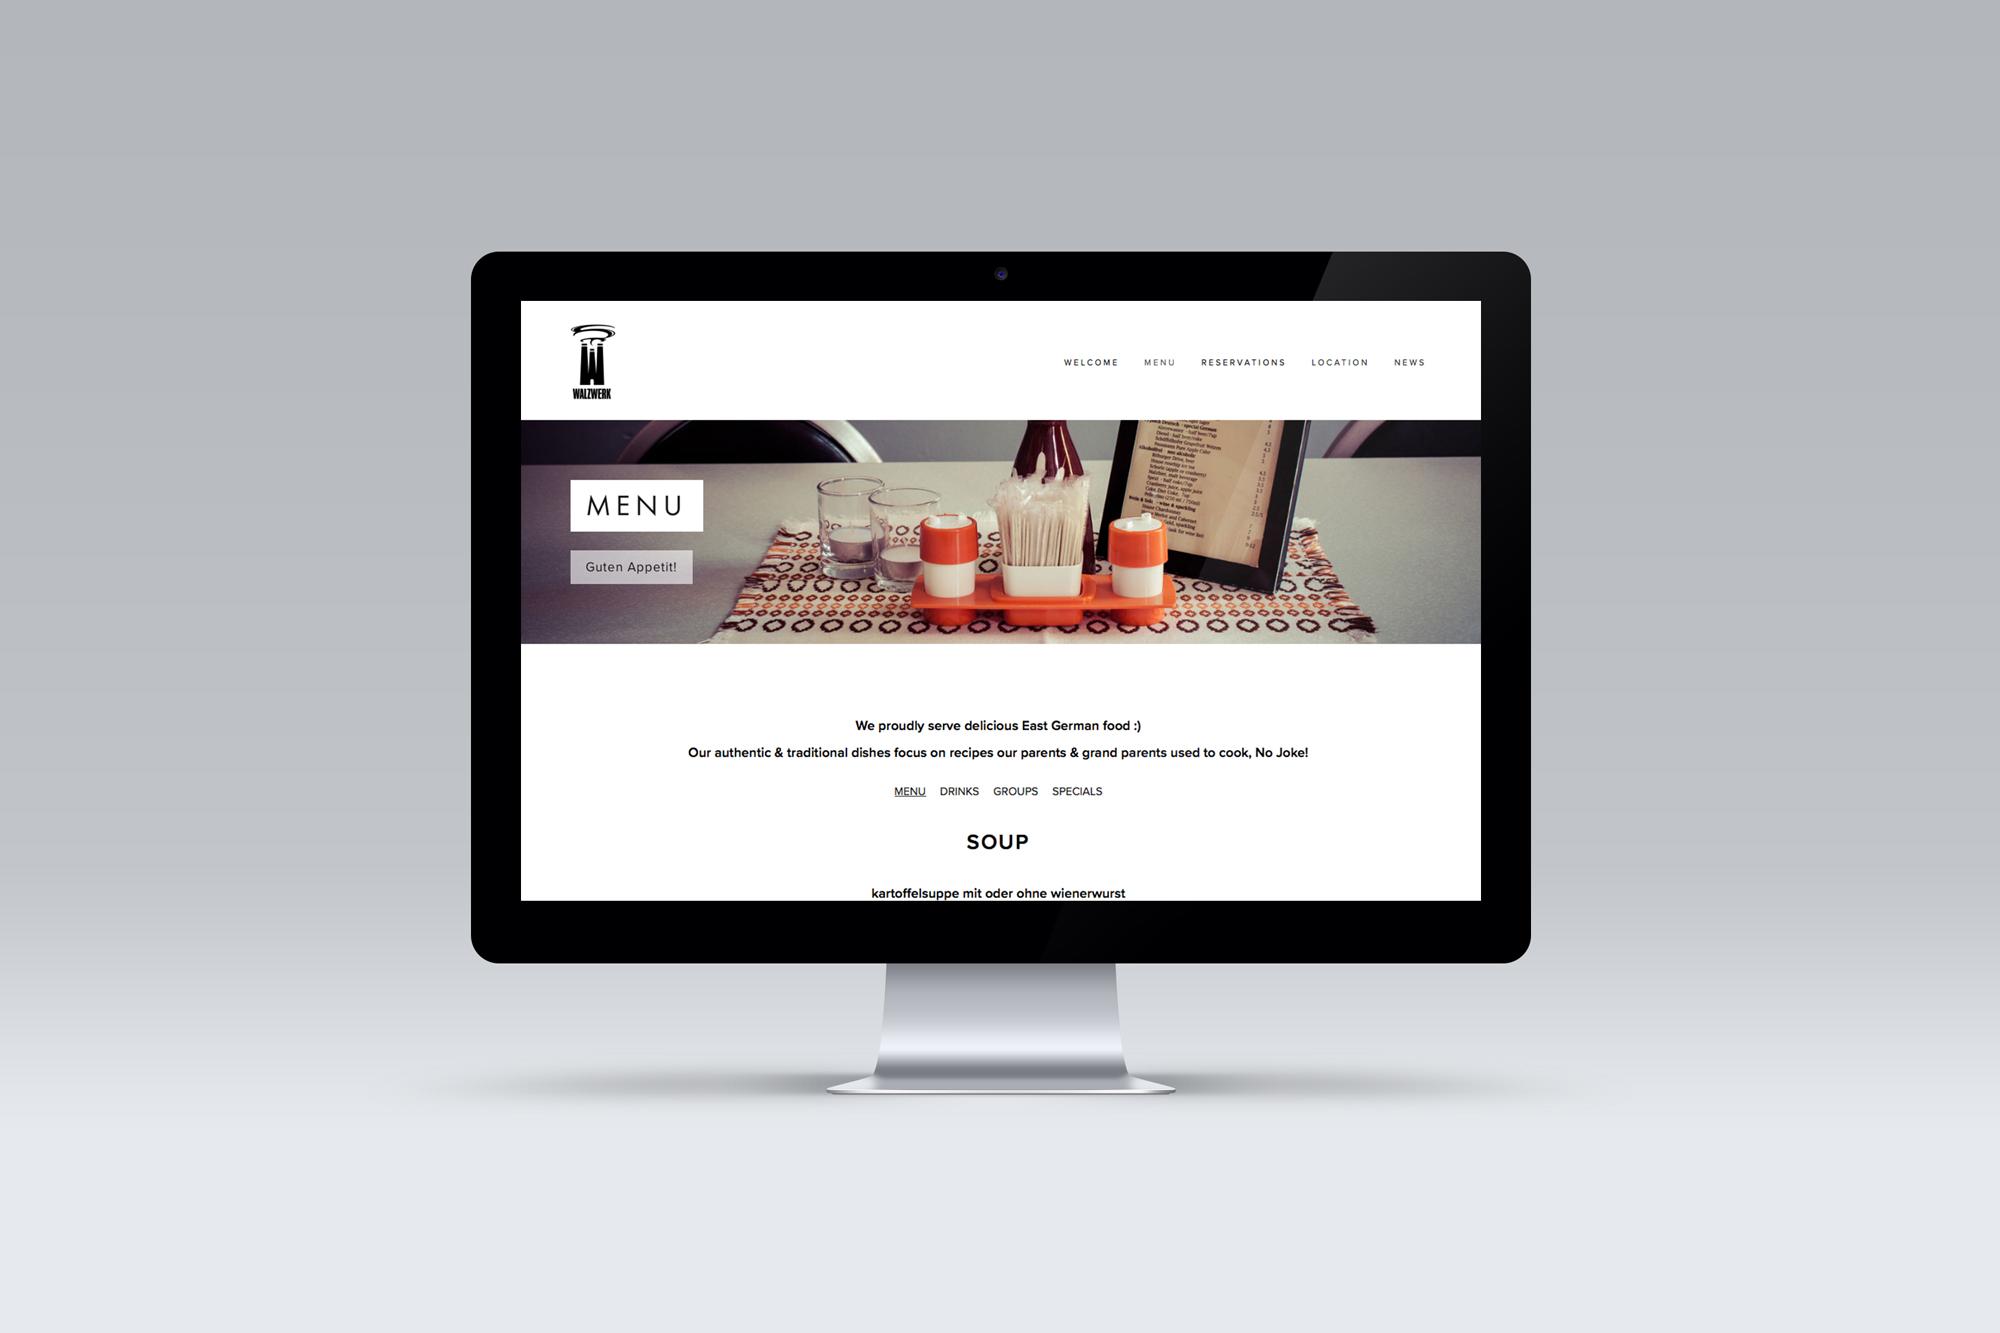 WW-Website-menu-Mock-up.jpg